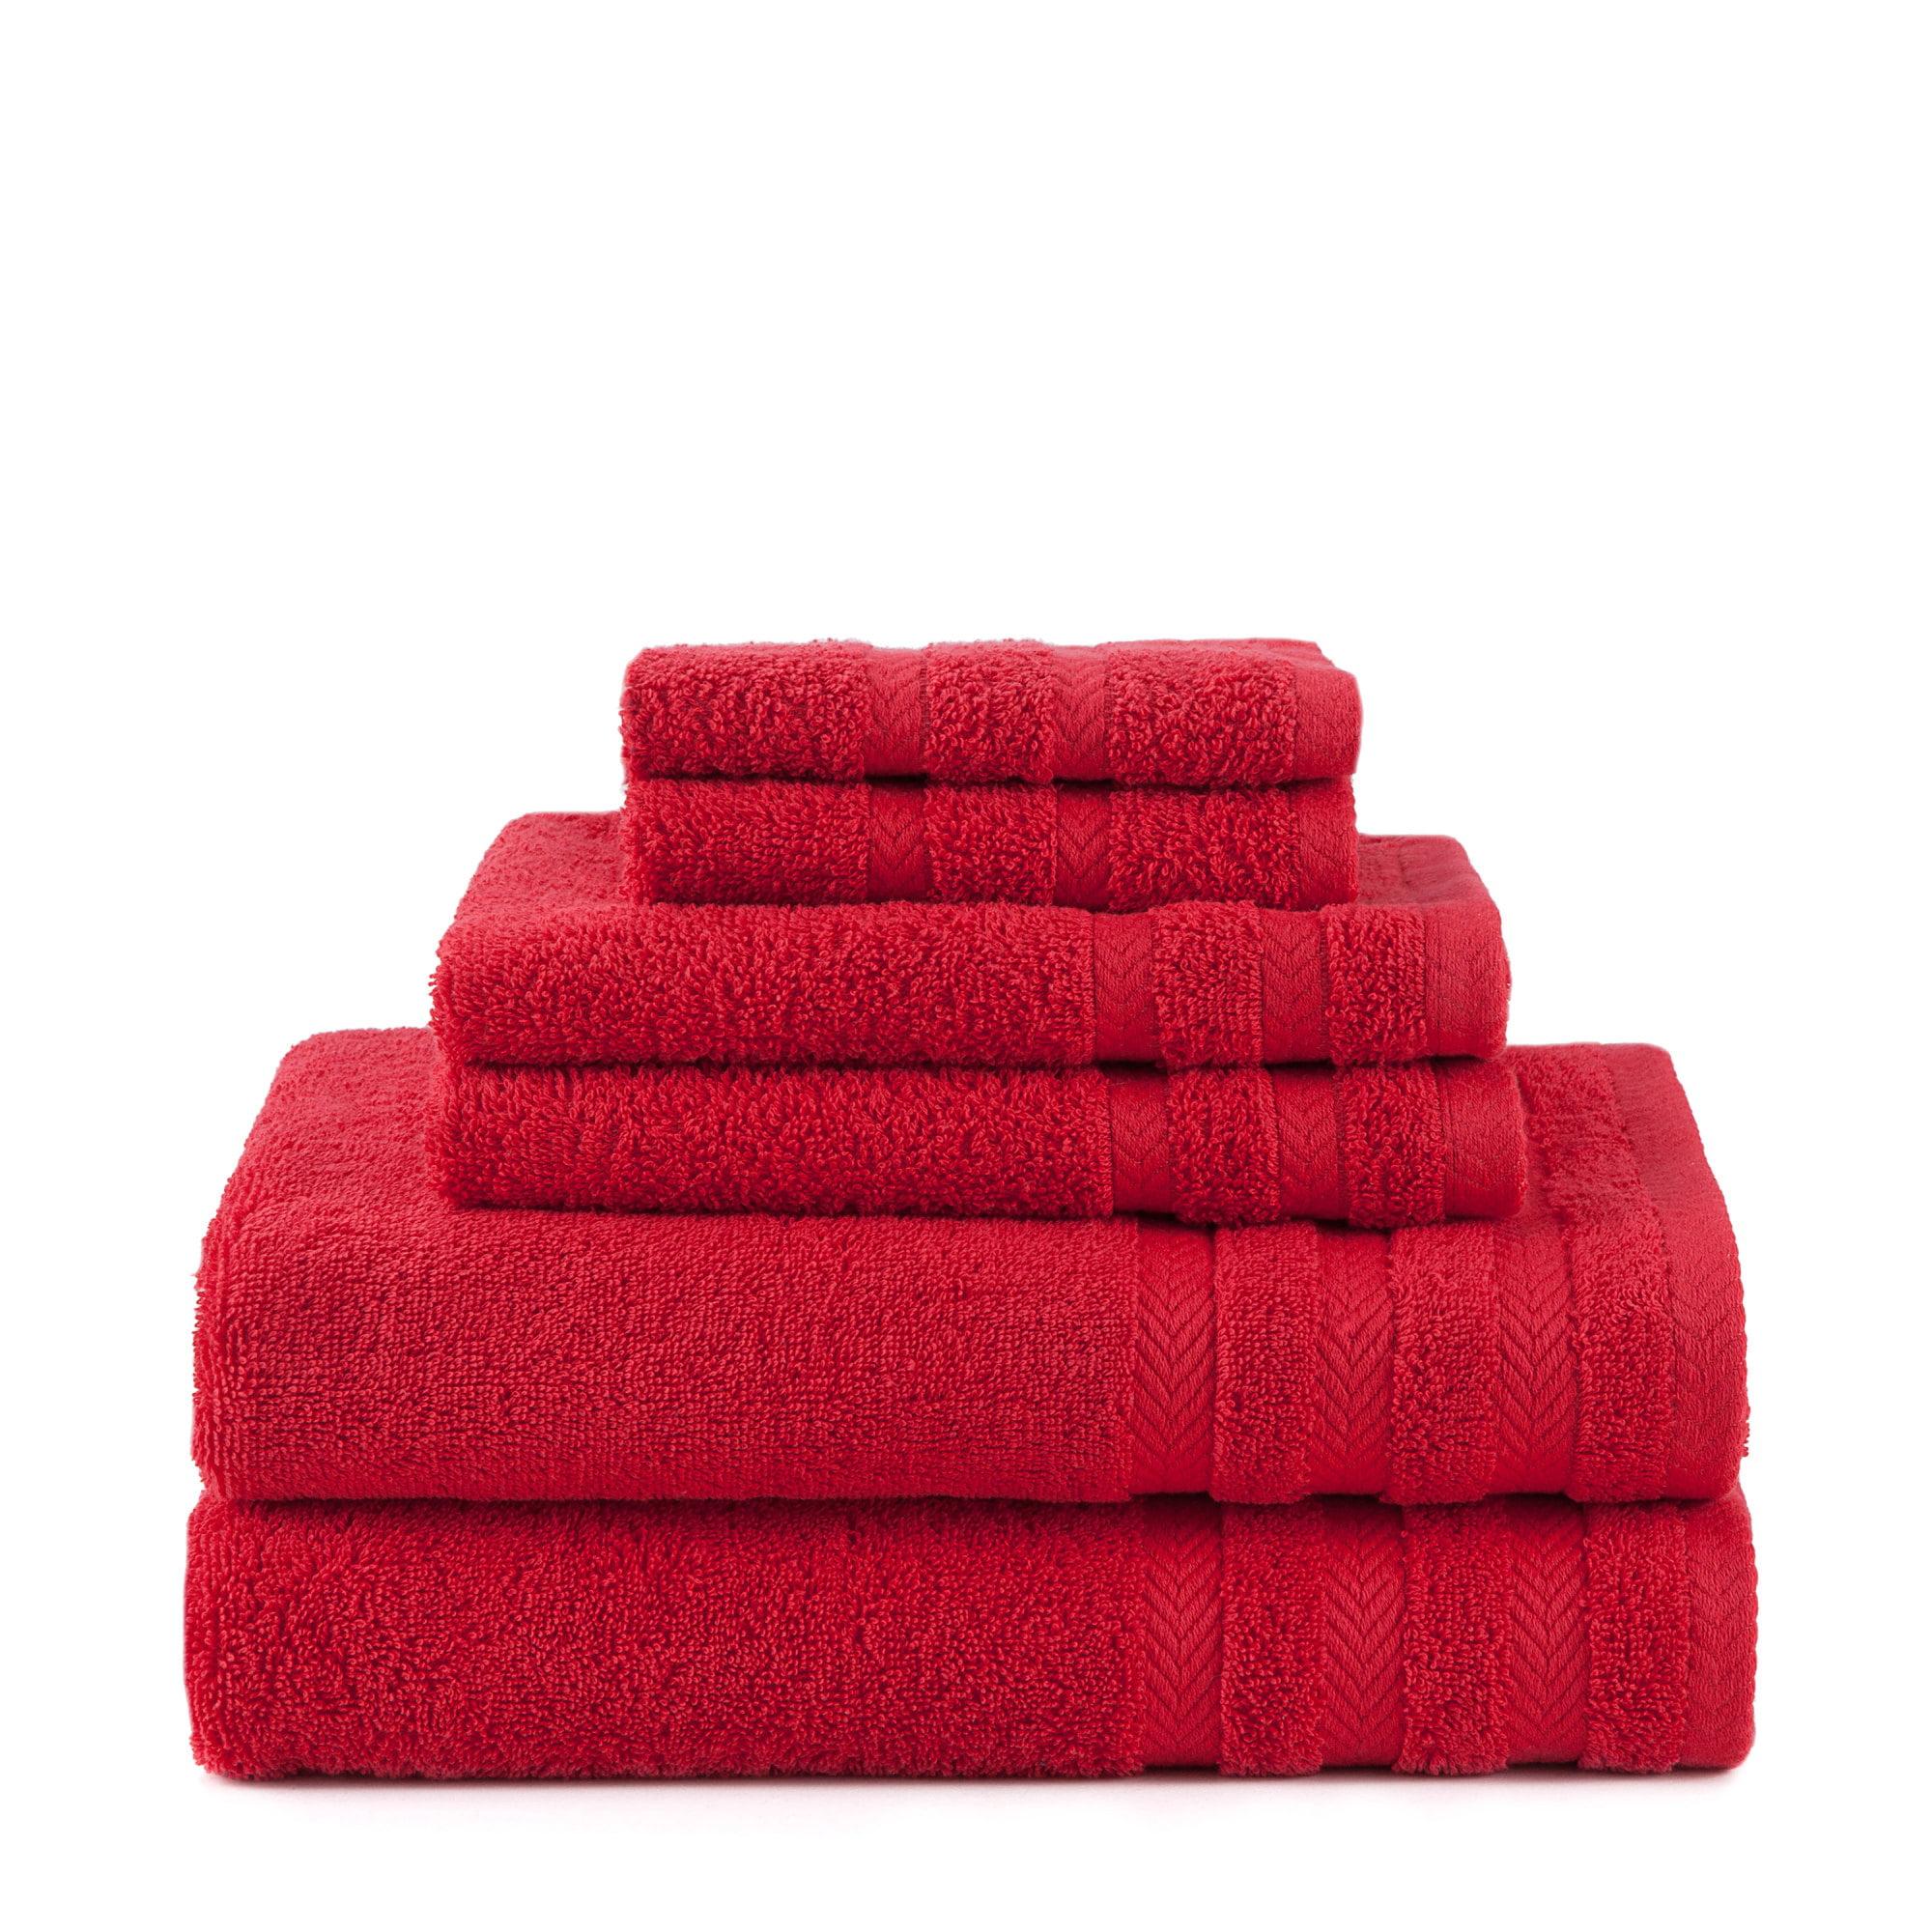 Egyptian Cotton With Dryfast 6 Piece Black Plum Towel Set